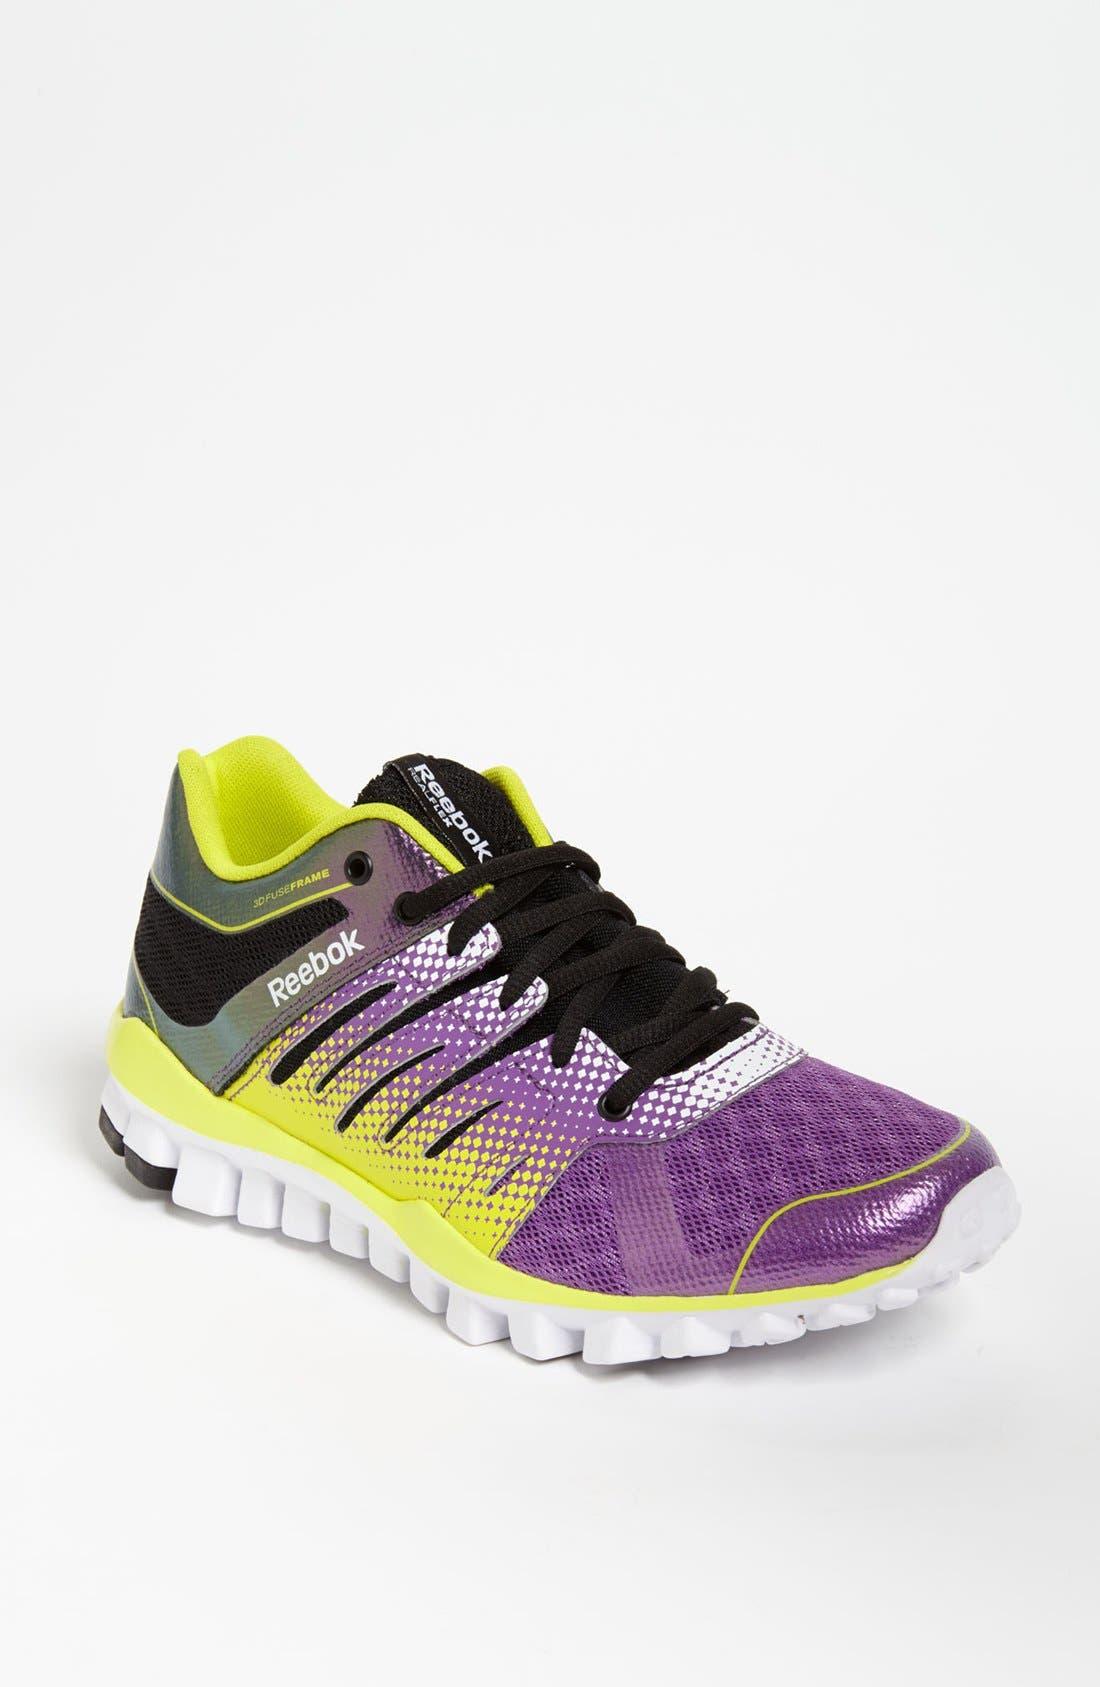 Main Image - Reebok 'RealFlex Strength' Training Shoe (Women)